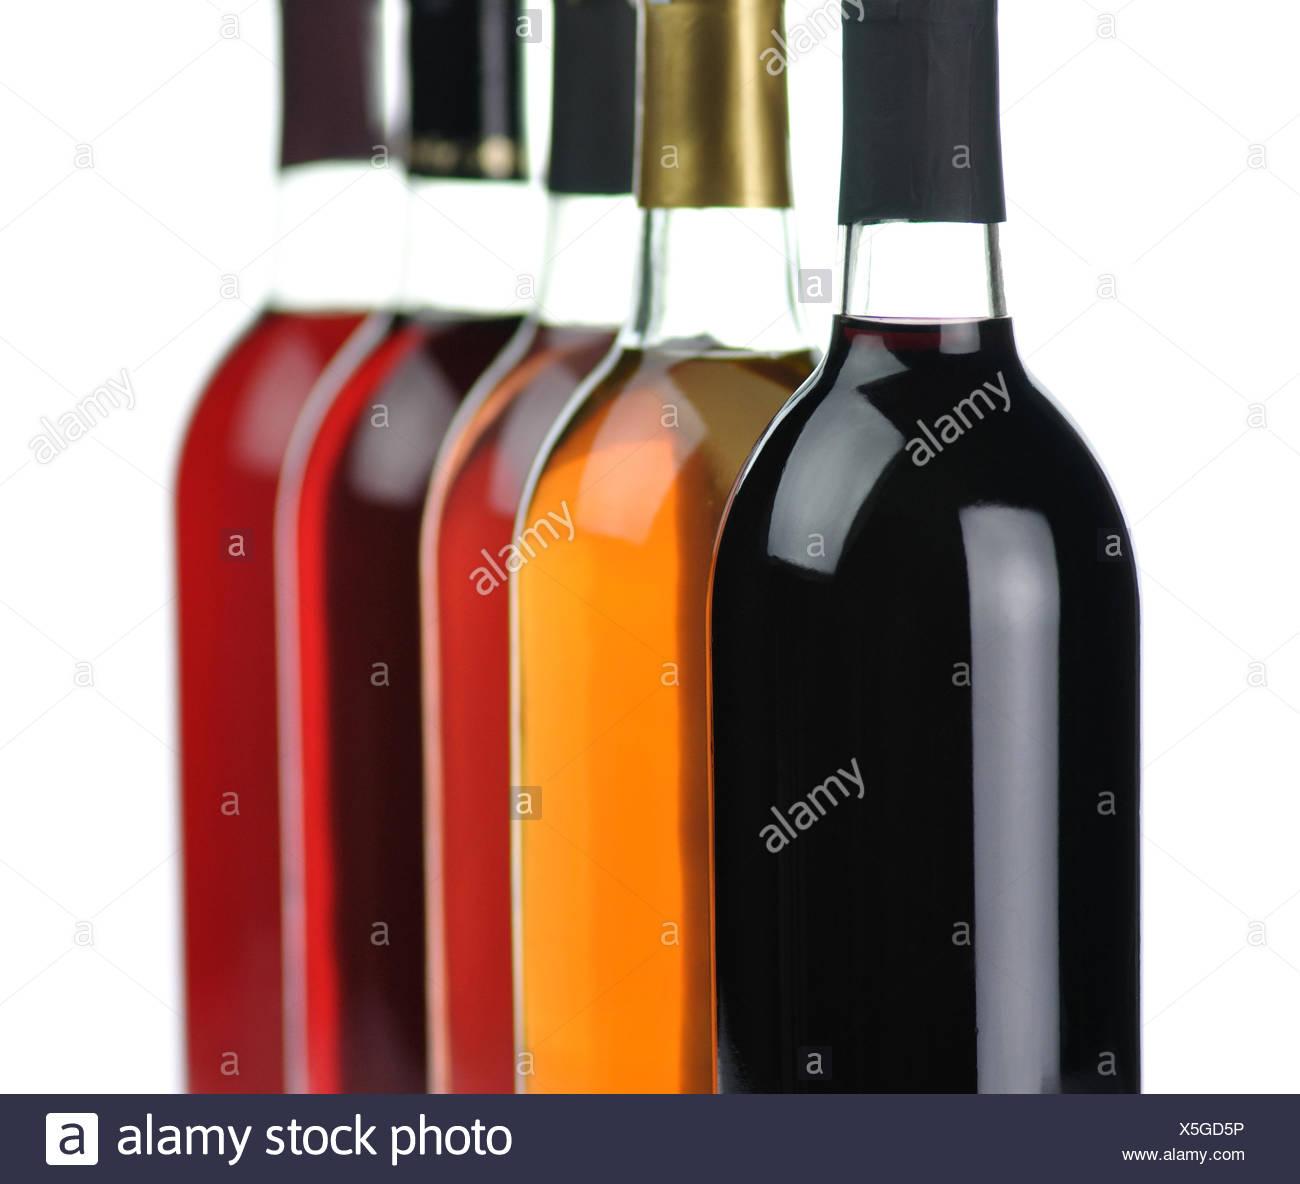 lots of wine bottles stock photos lots of wine bottles stock